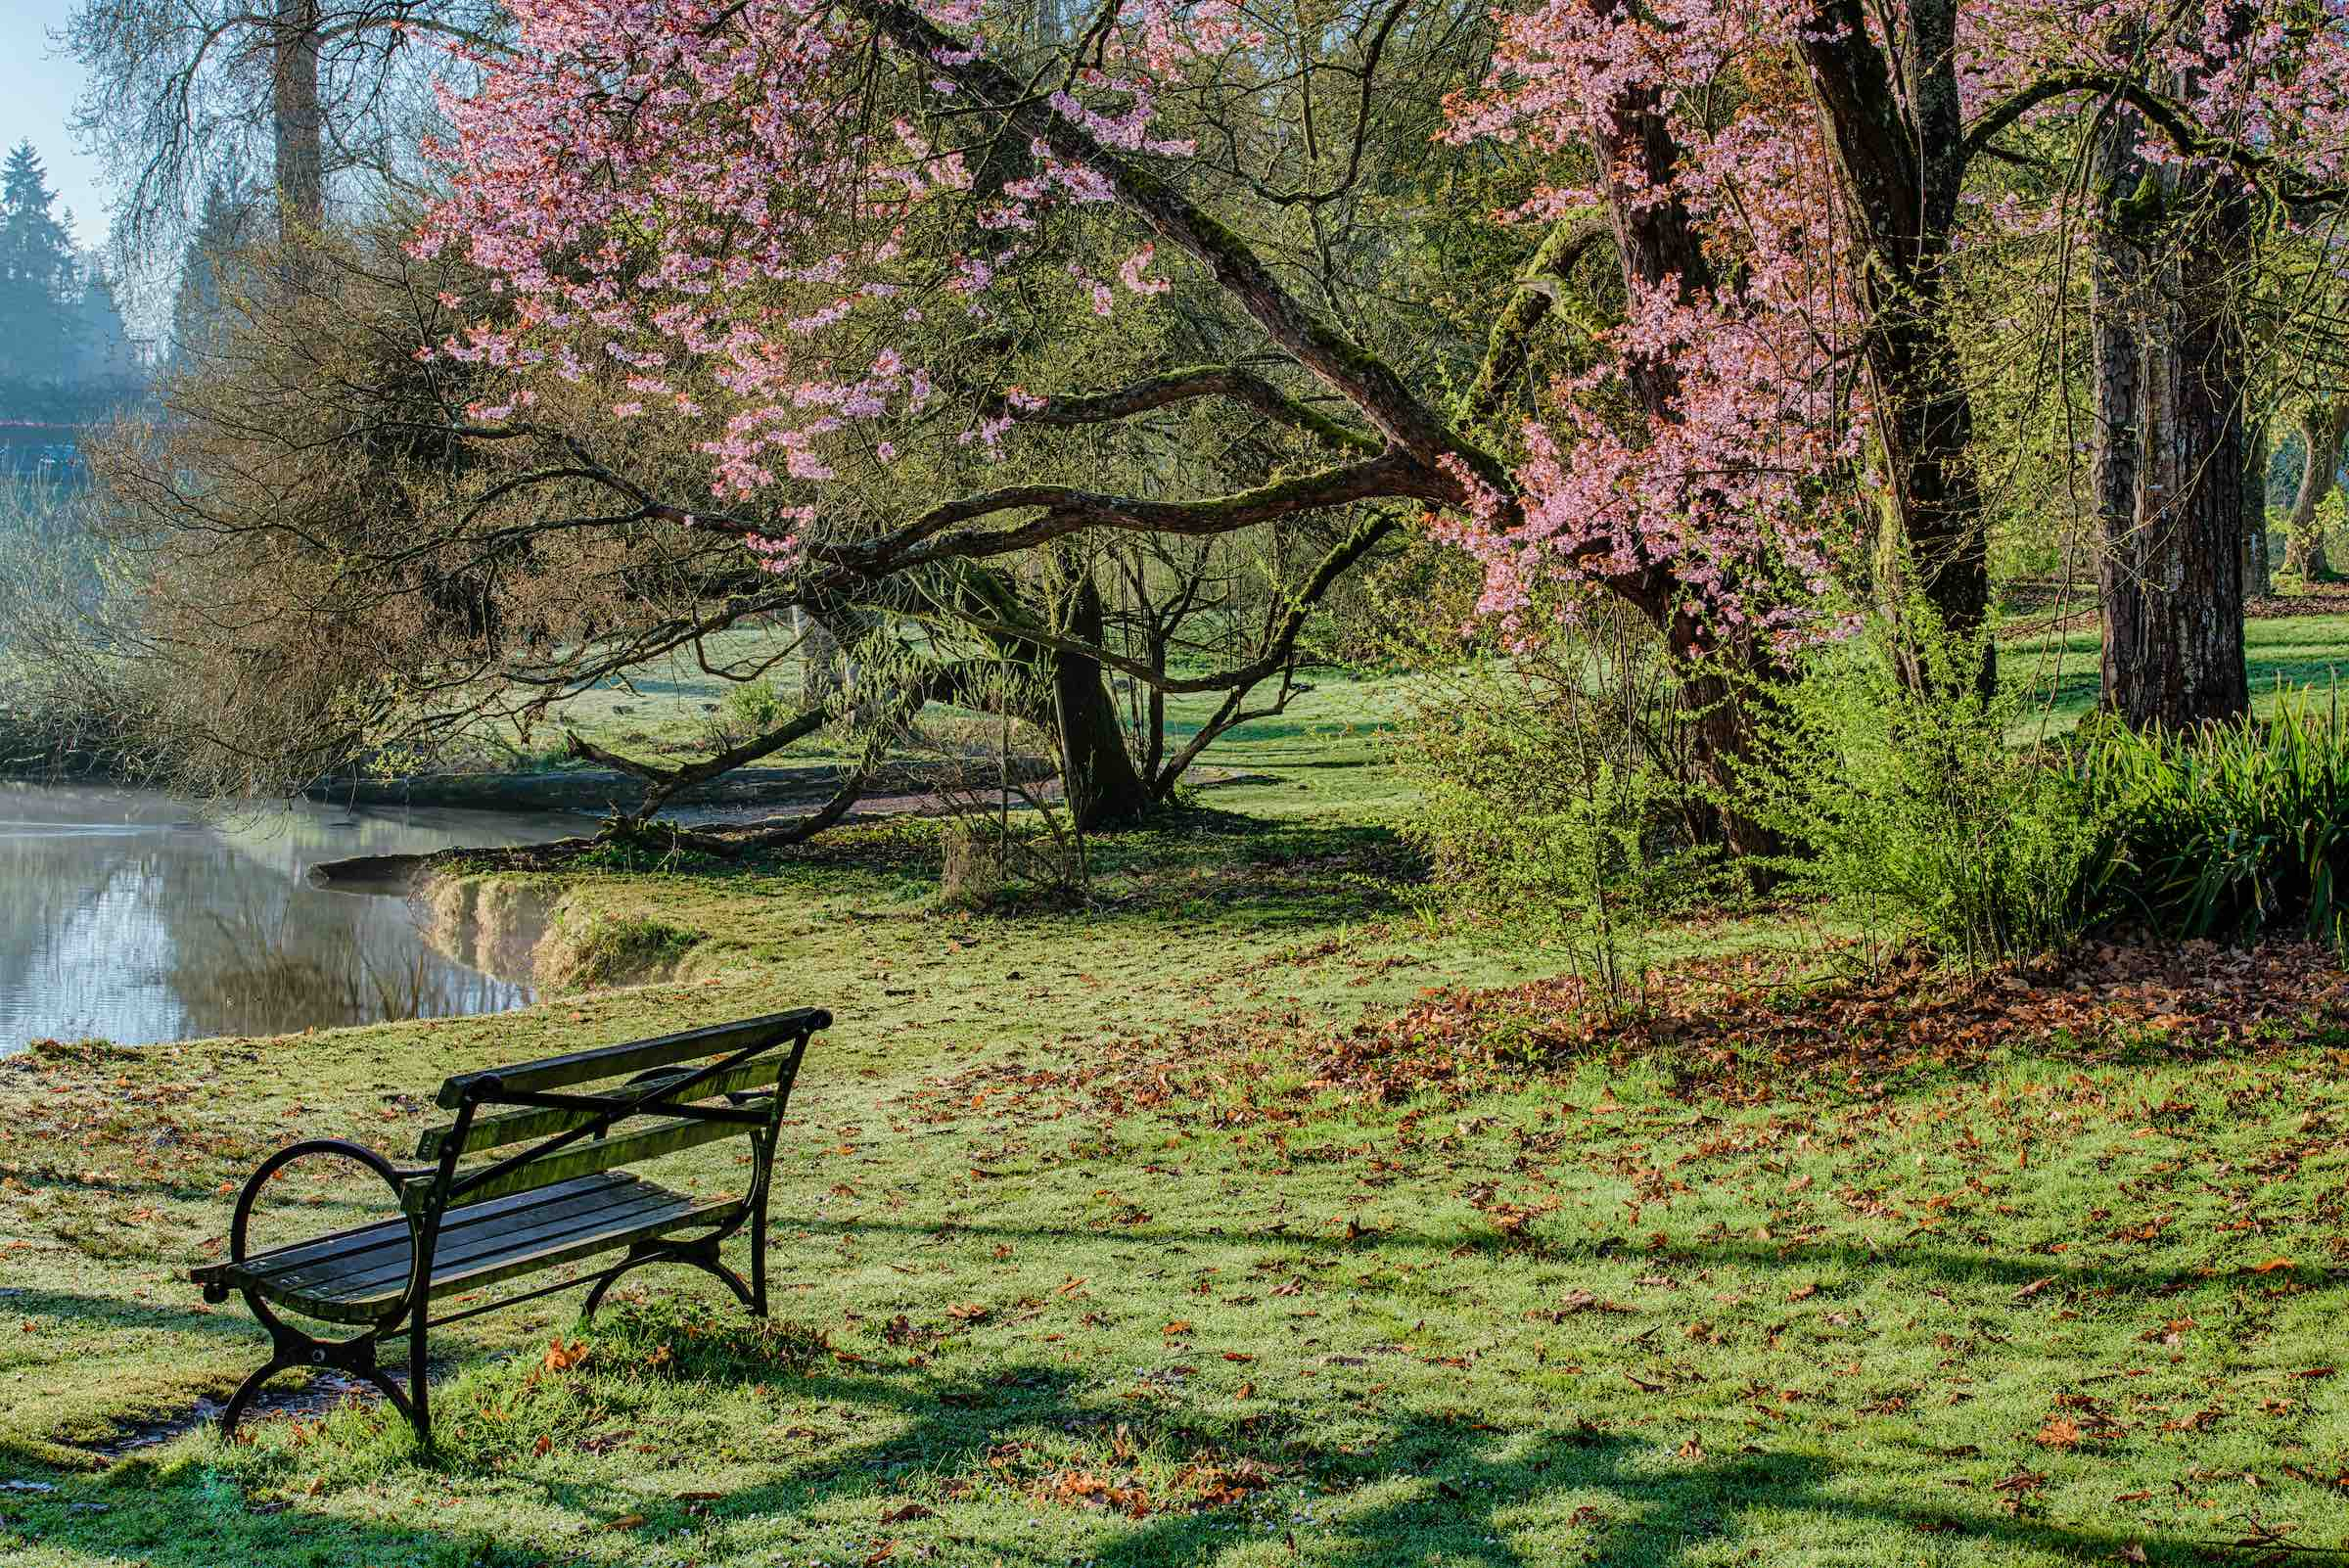 Washington Park Arboretum P34-11_HDRPS.jpg